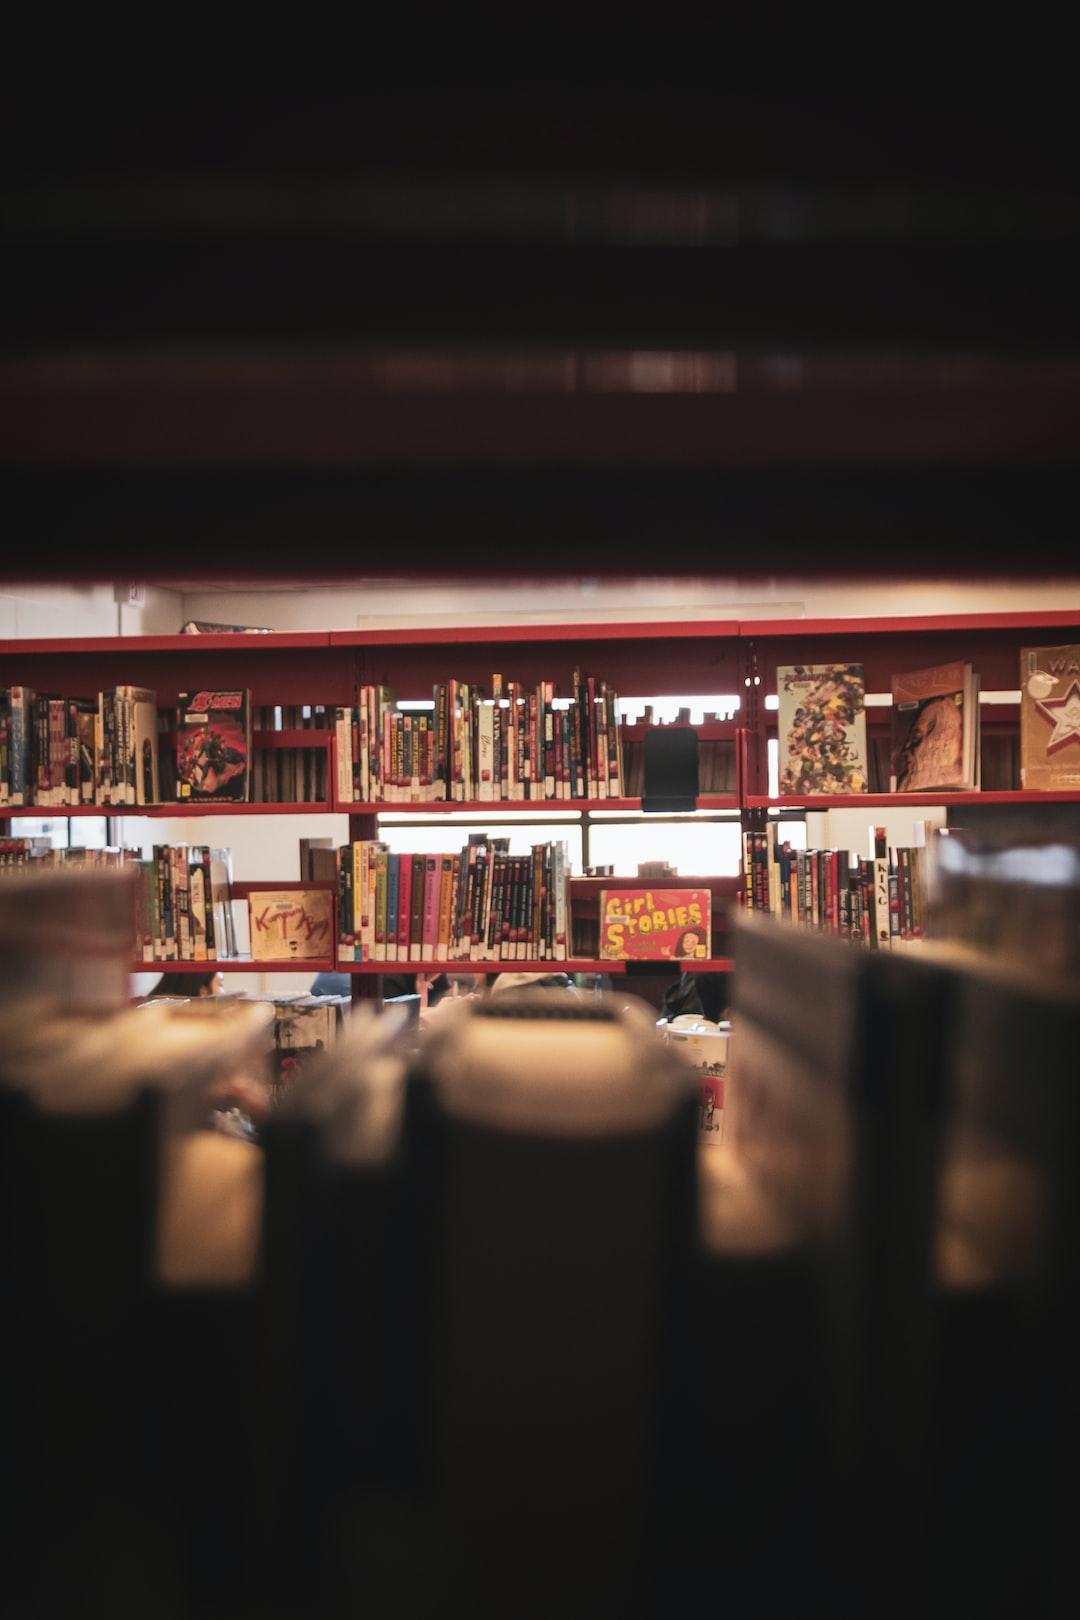 Looking through the bookshelves